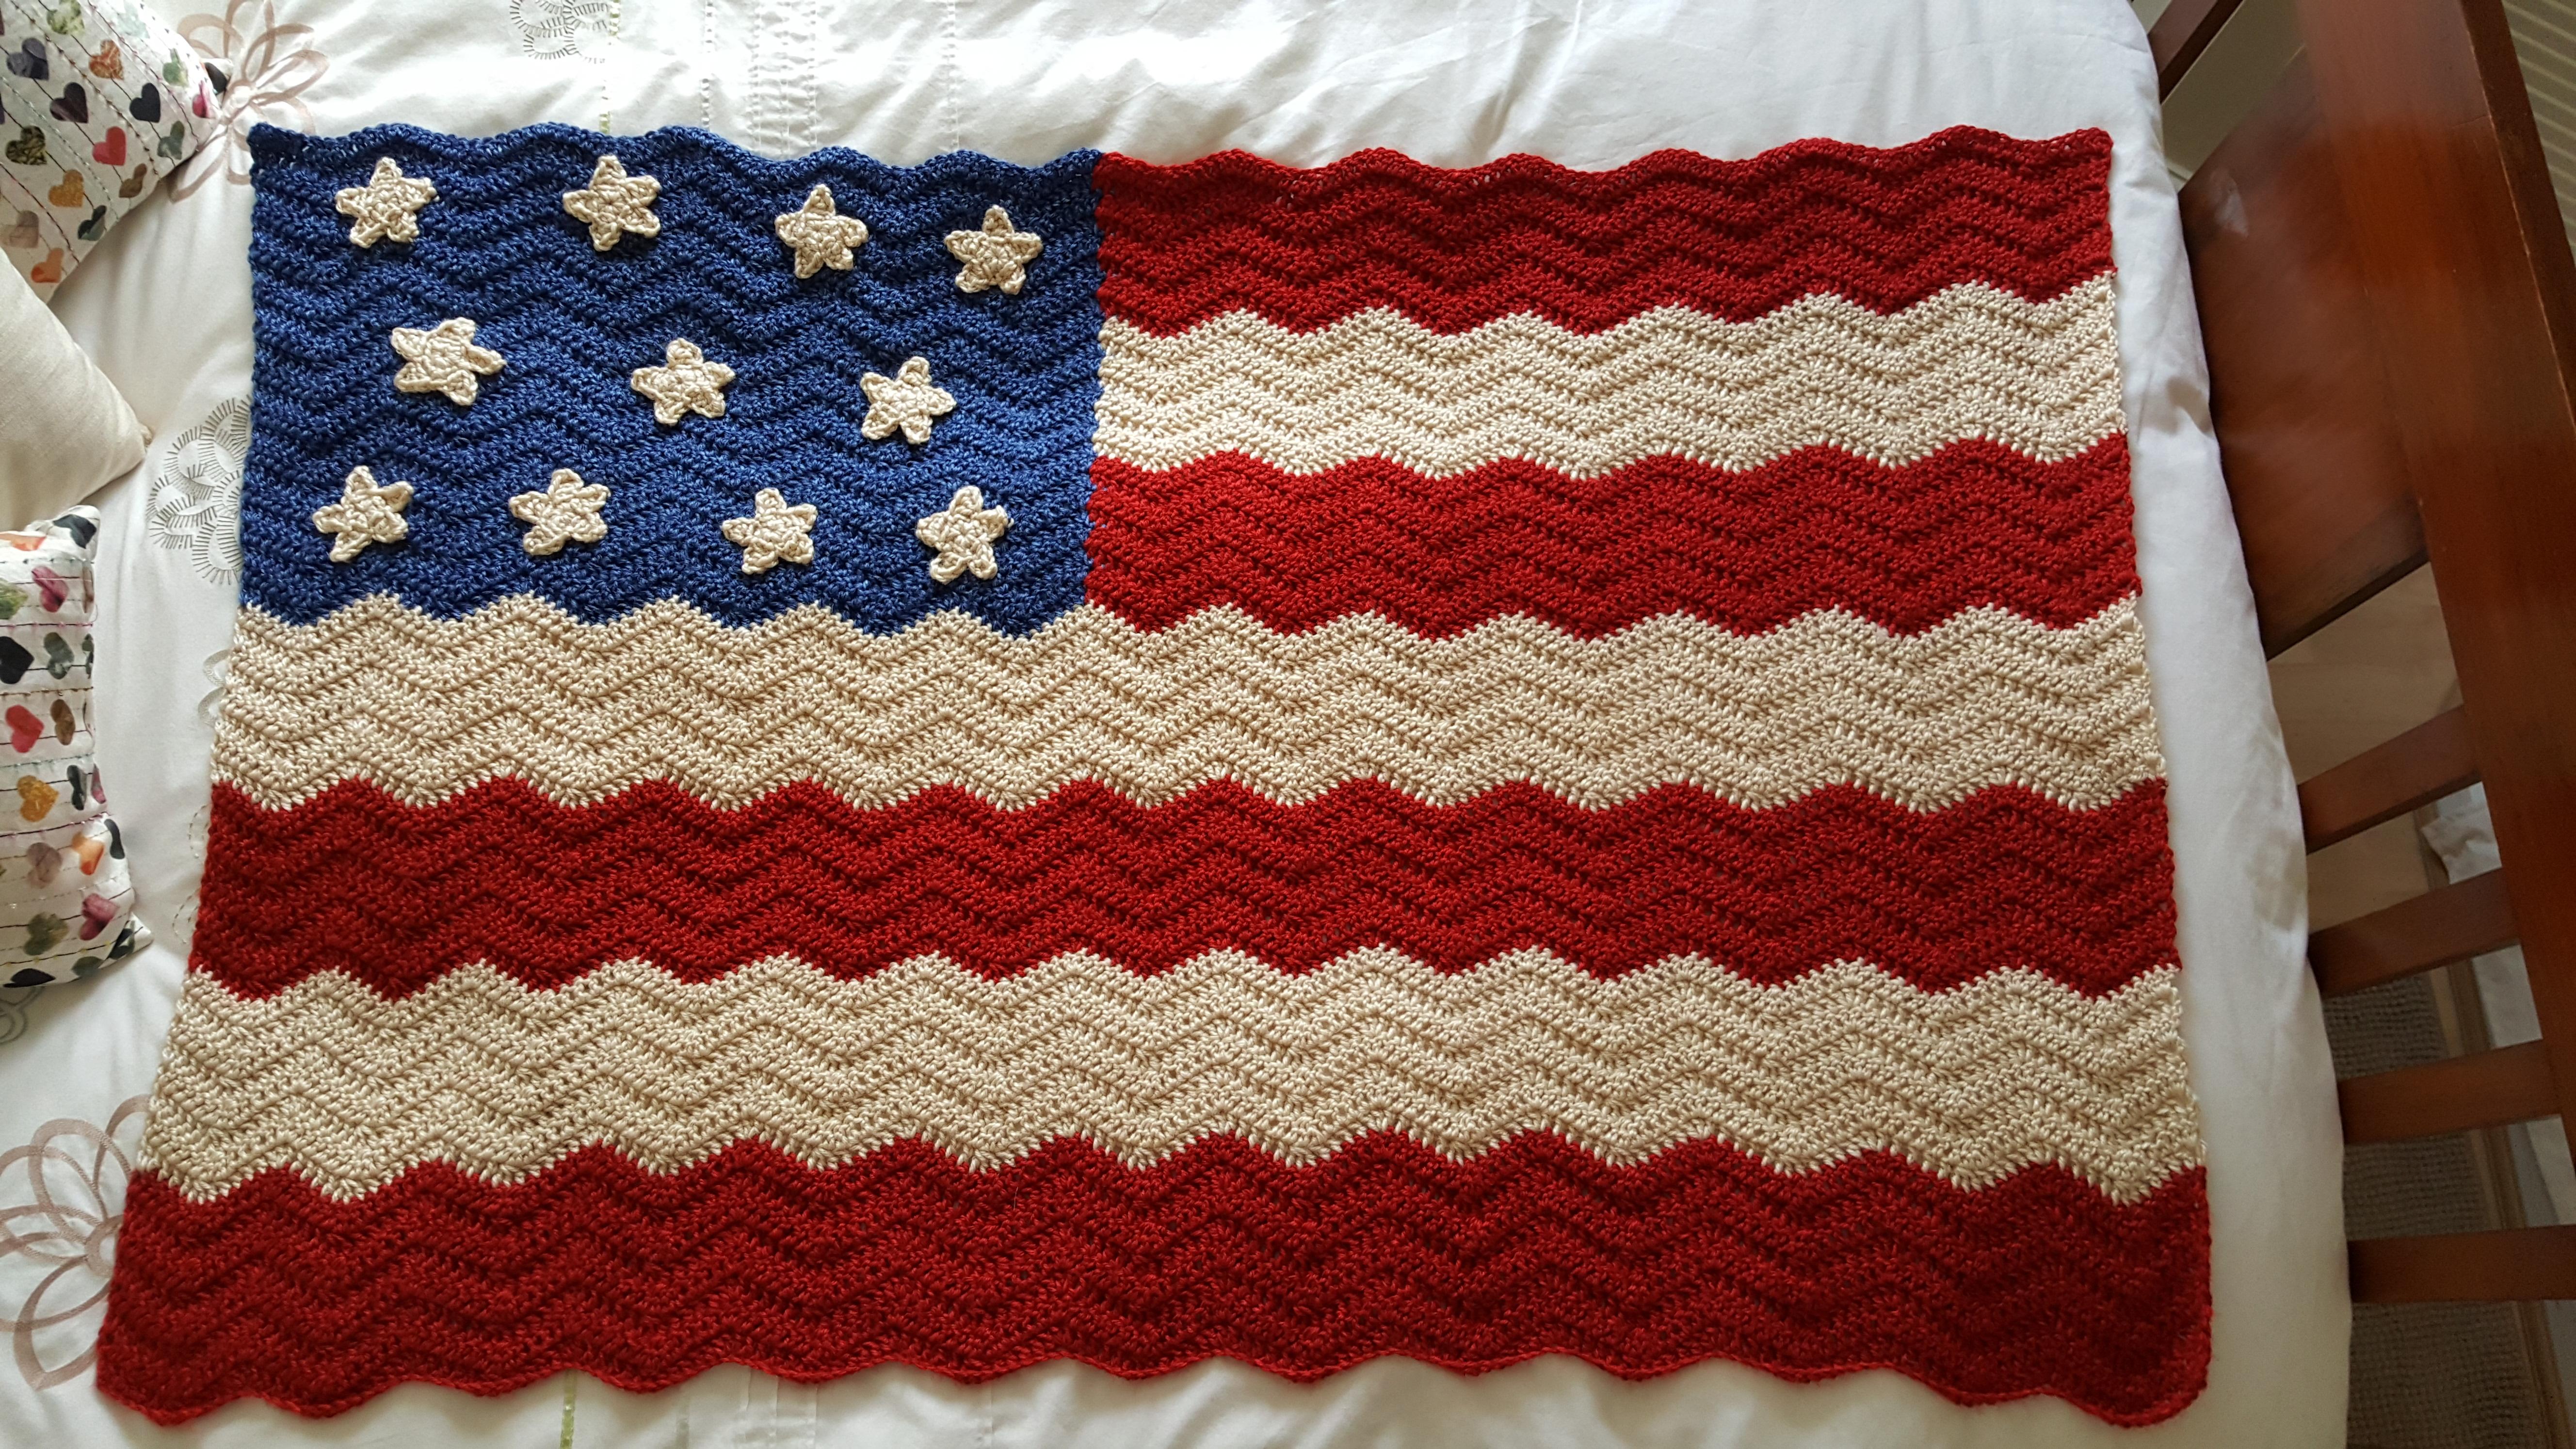 Scrappy Baby Blanket Progress & New Baby Blanket Project | Fizzy ...